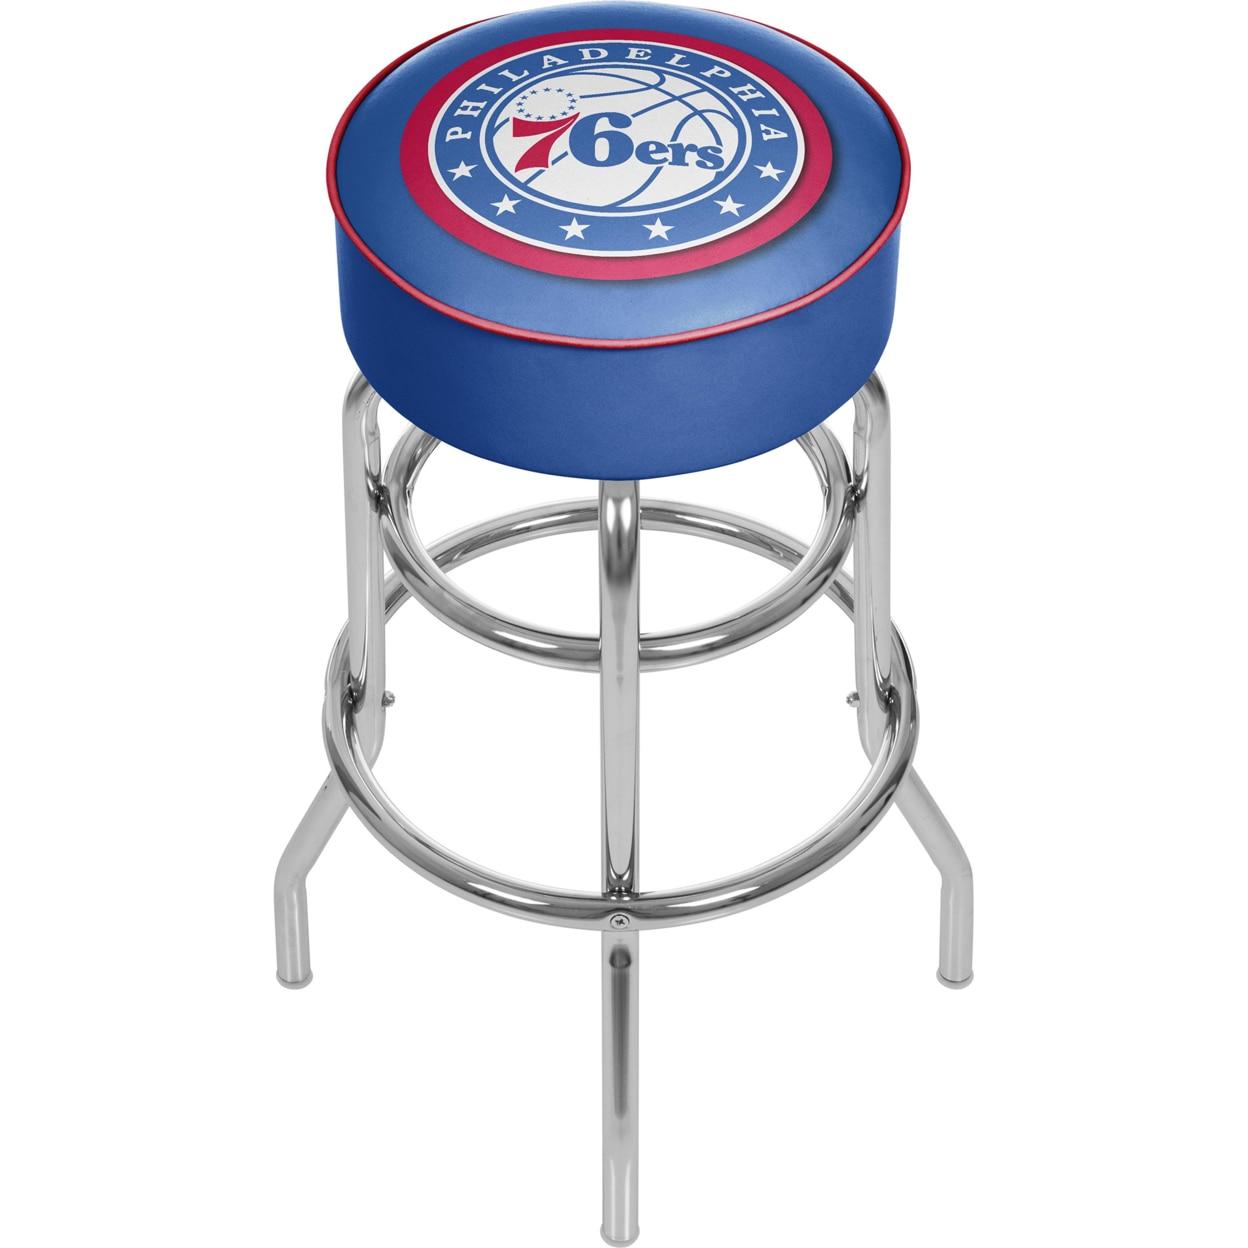 Philadelphia 76ers NBA Padded Swivel Bar Stool 30 Inches High philadelphia 76ers new era nba wide point throwback cuffed knit hat